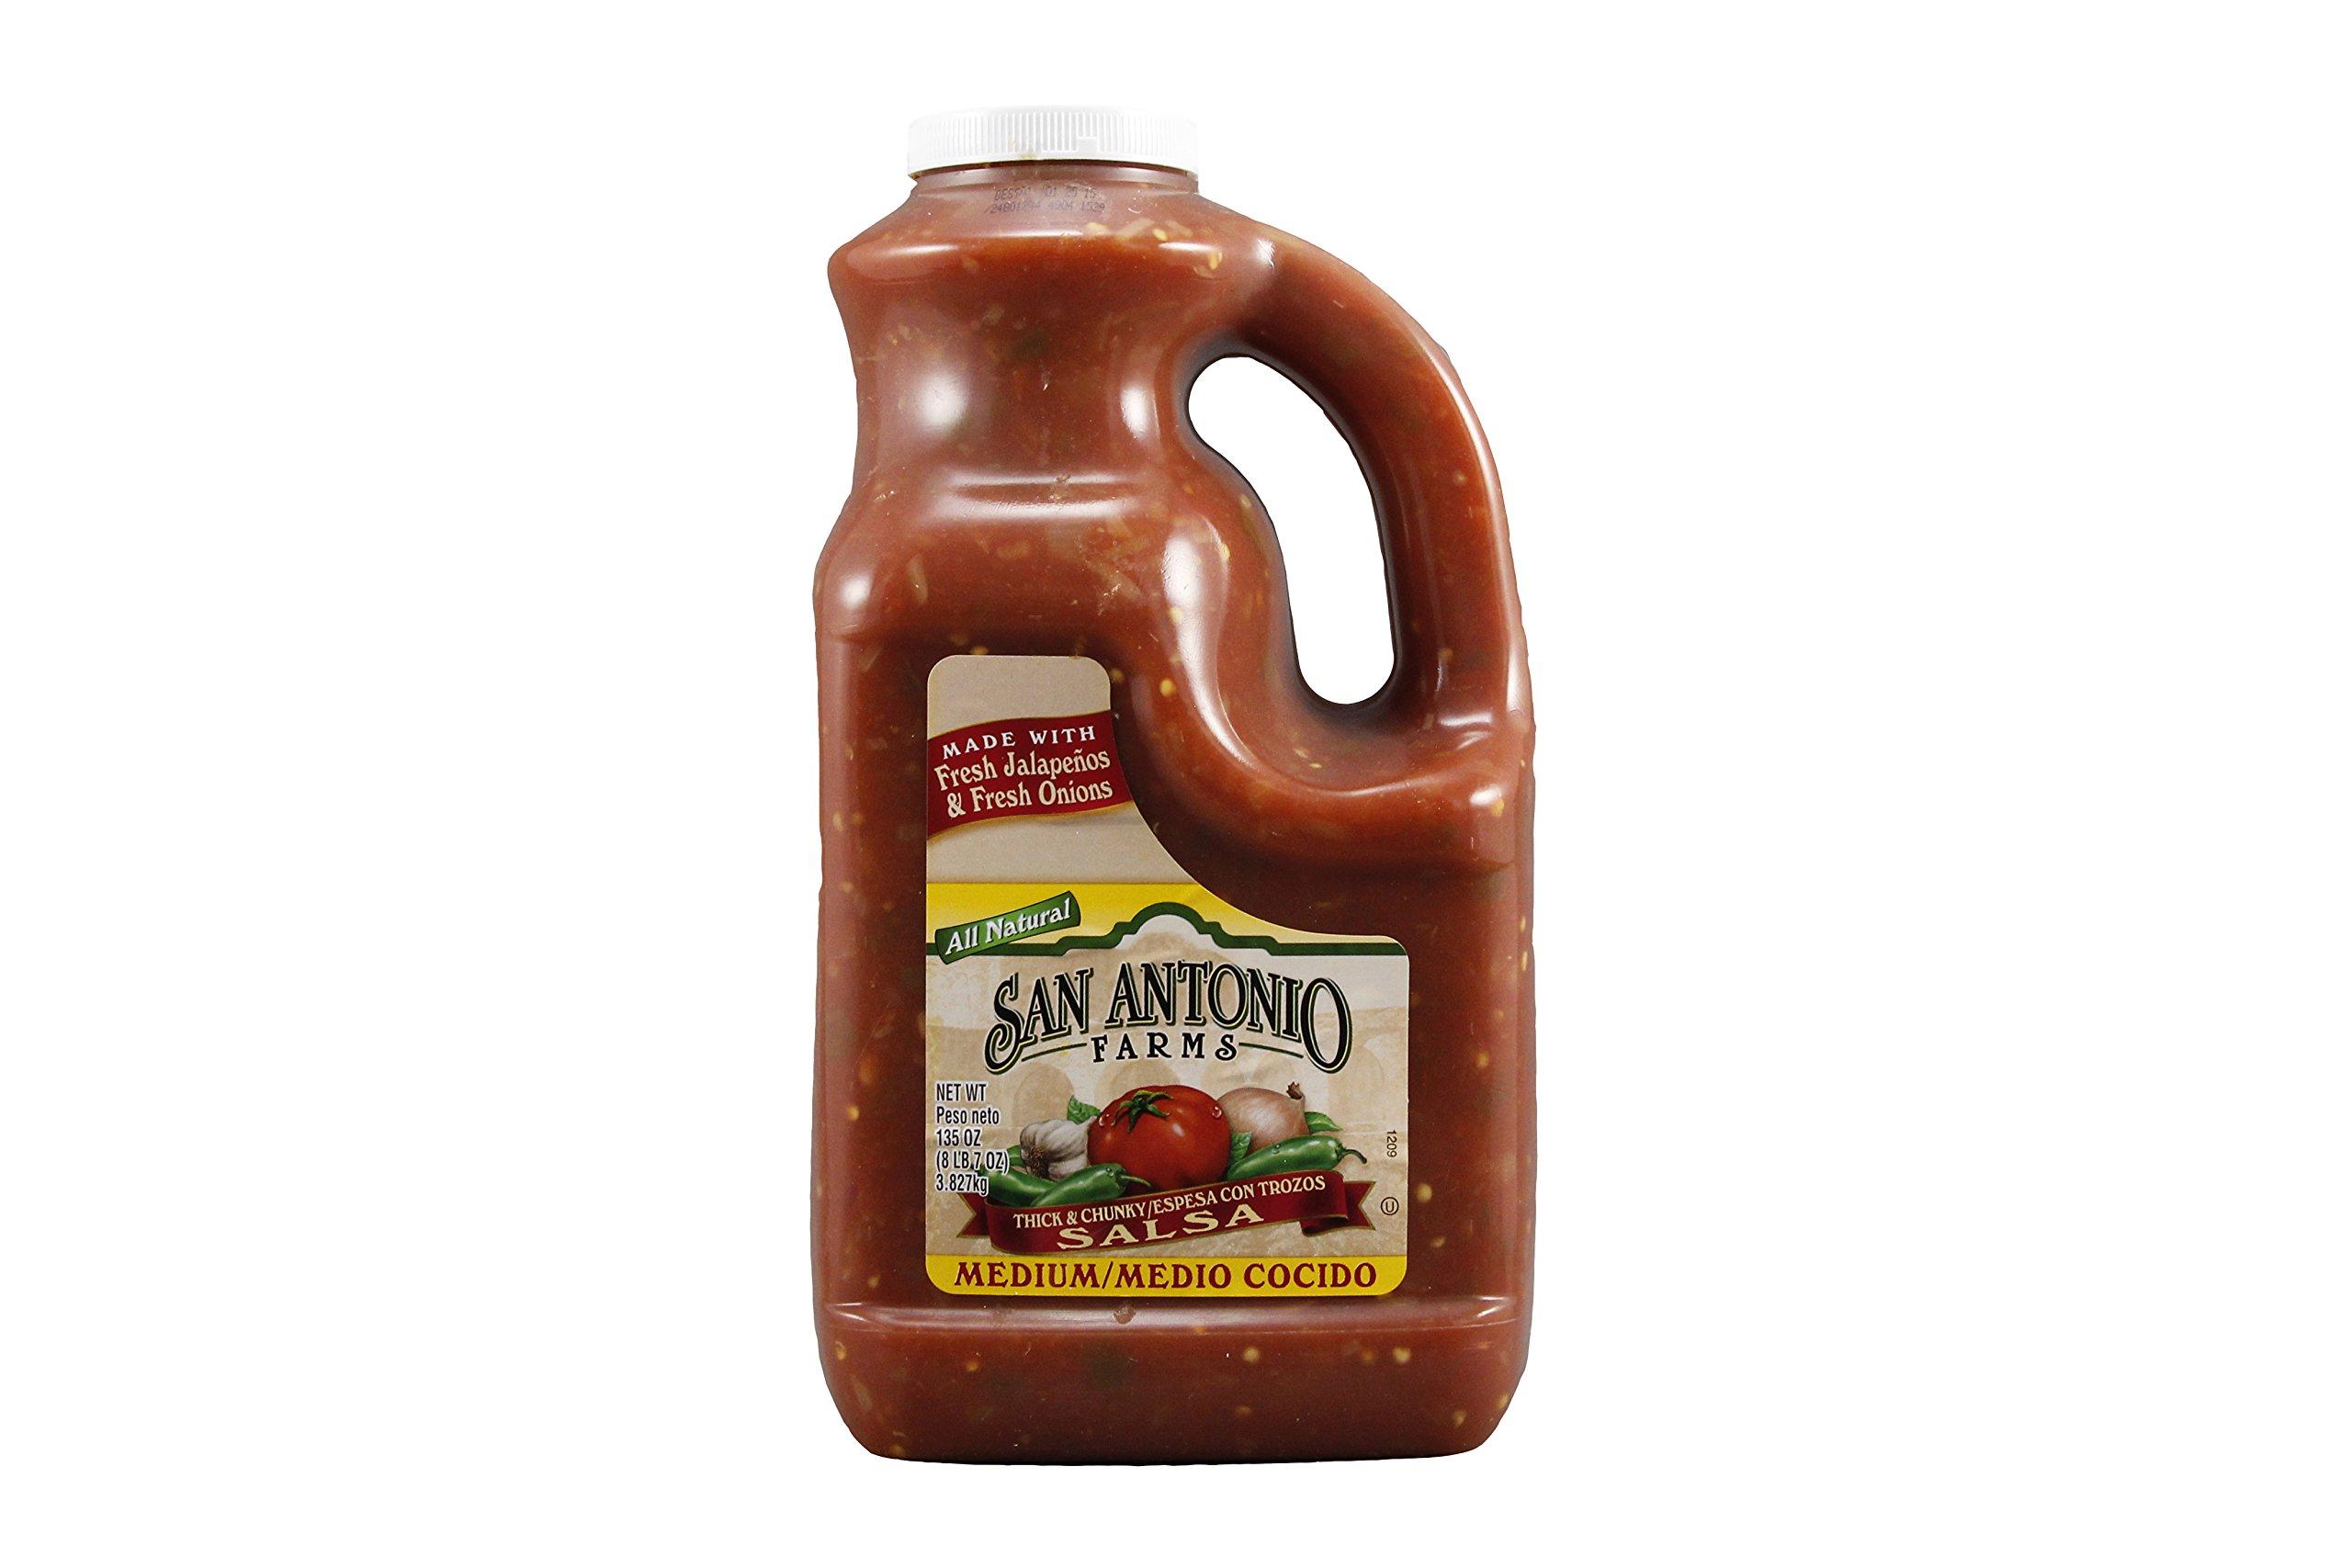 San Antonio Farms Medium Authentic Chunky Salsa, 135 oz., 4 per case by San Antonio Farms